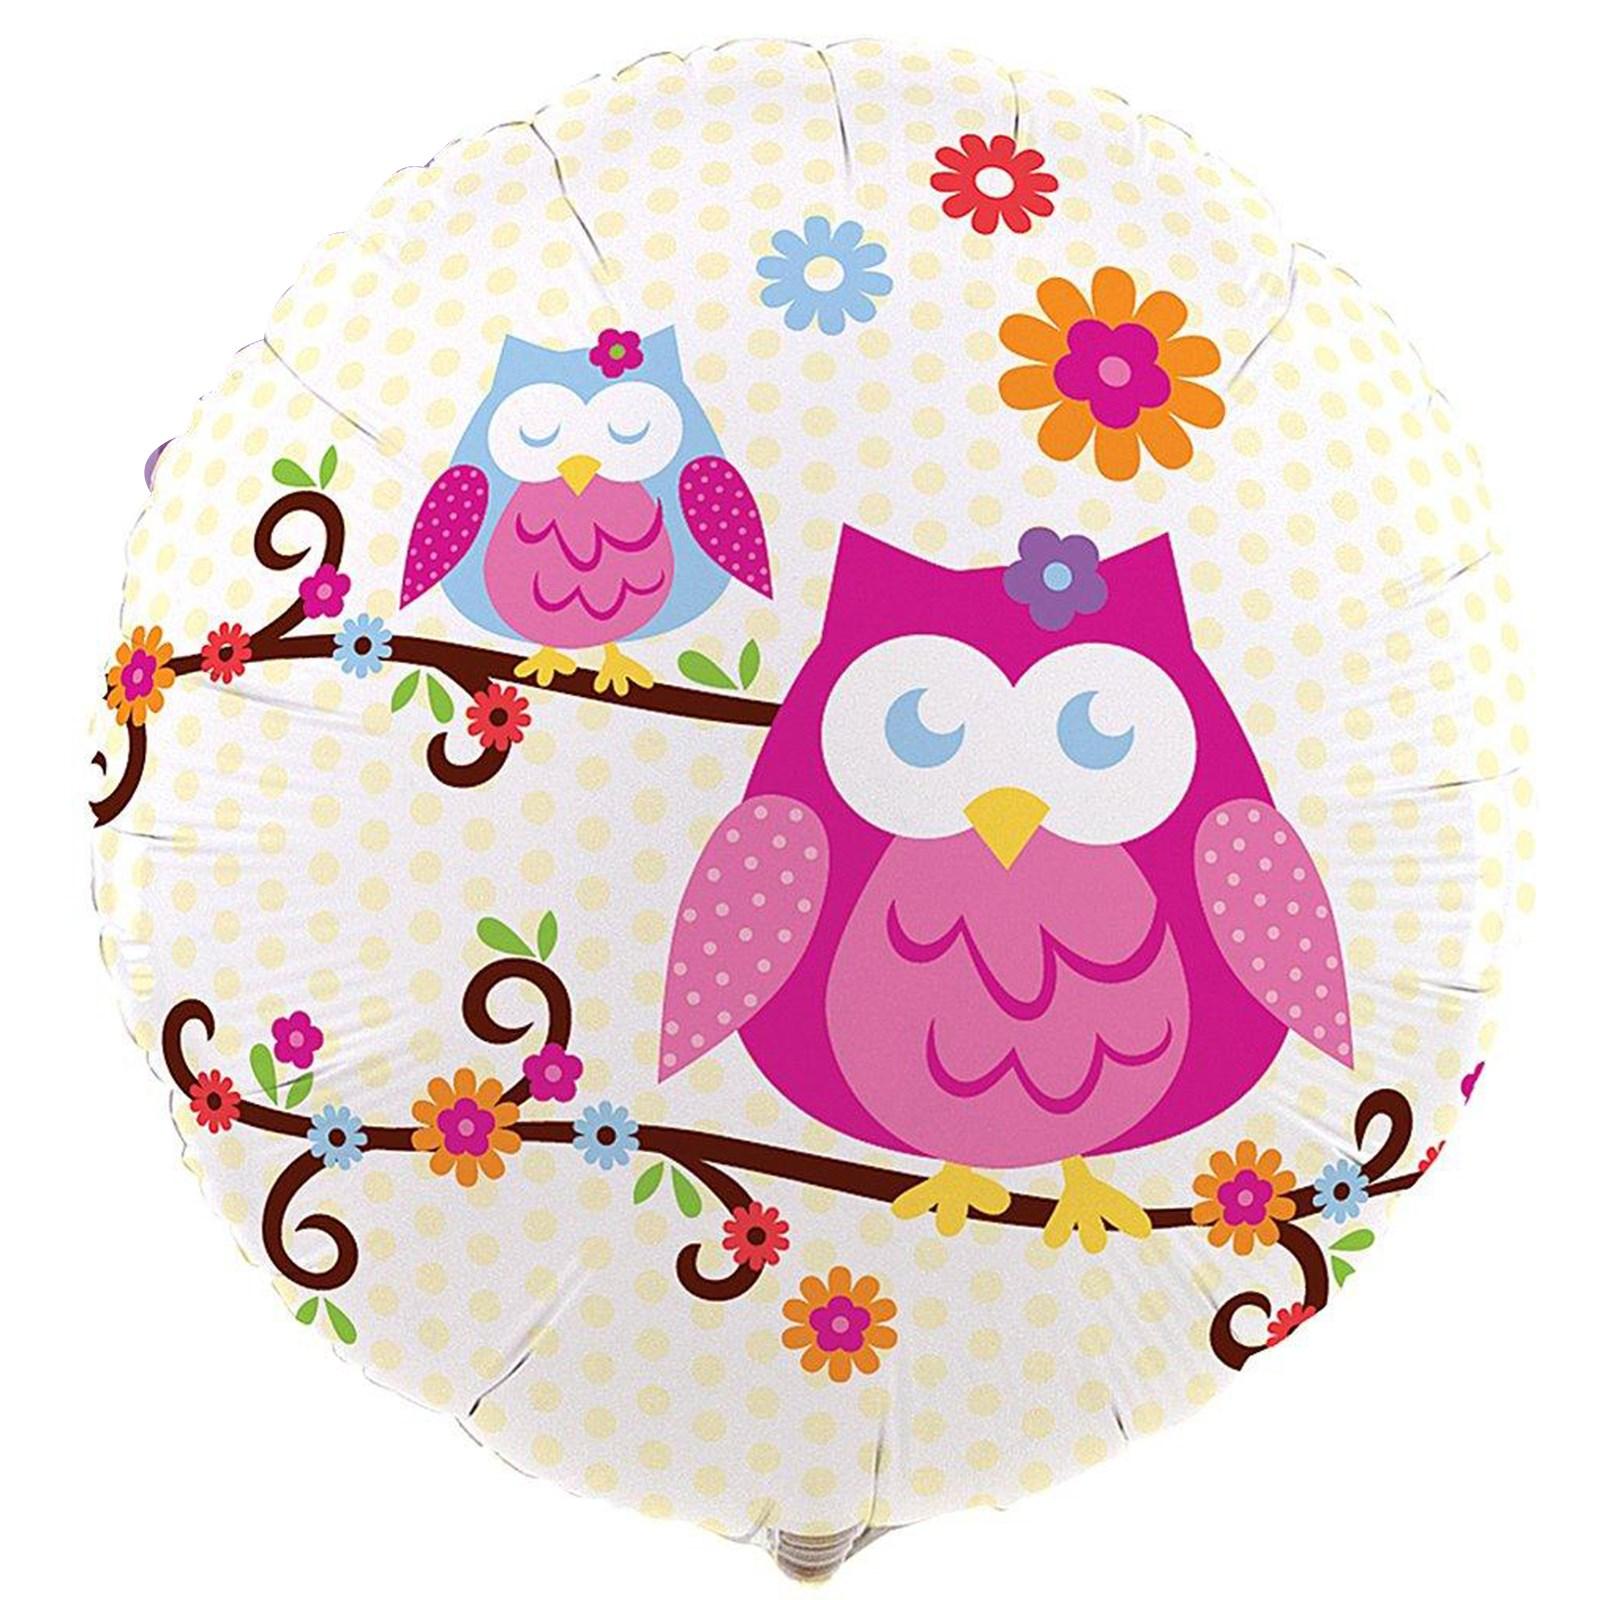 Owl Blossom Foil Balloon kids birthday partyware